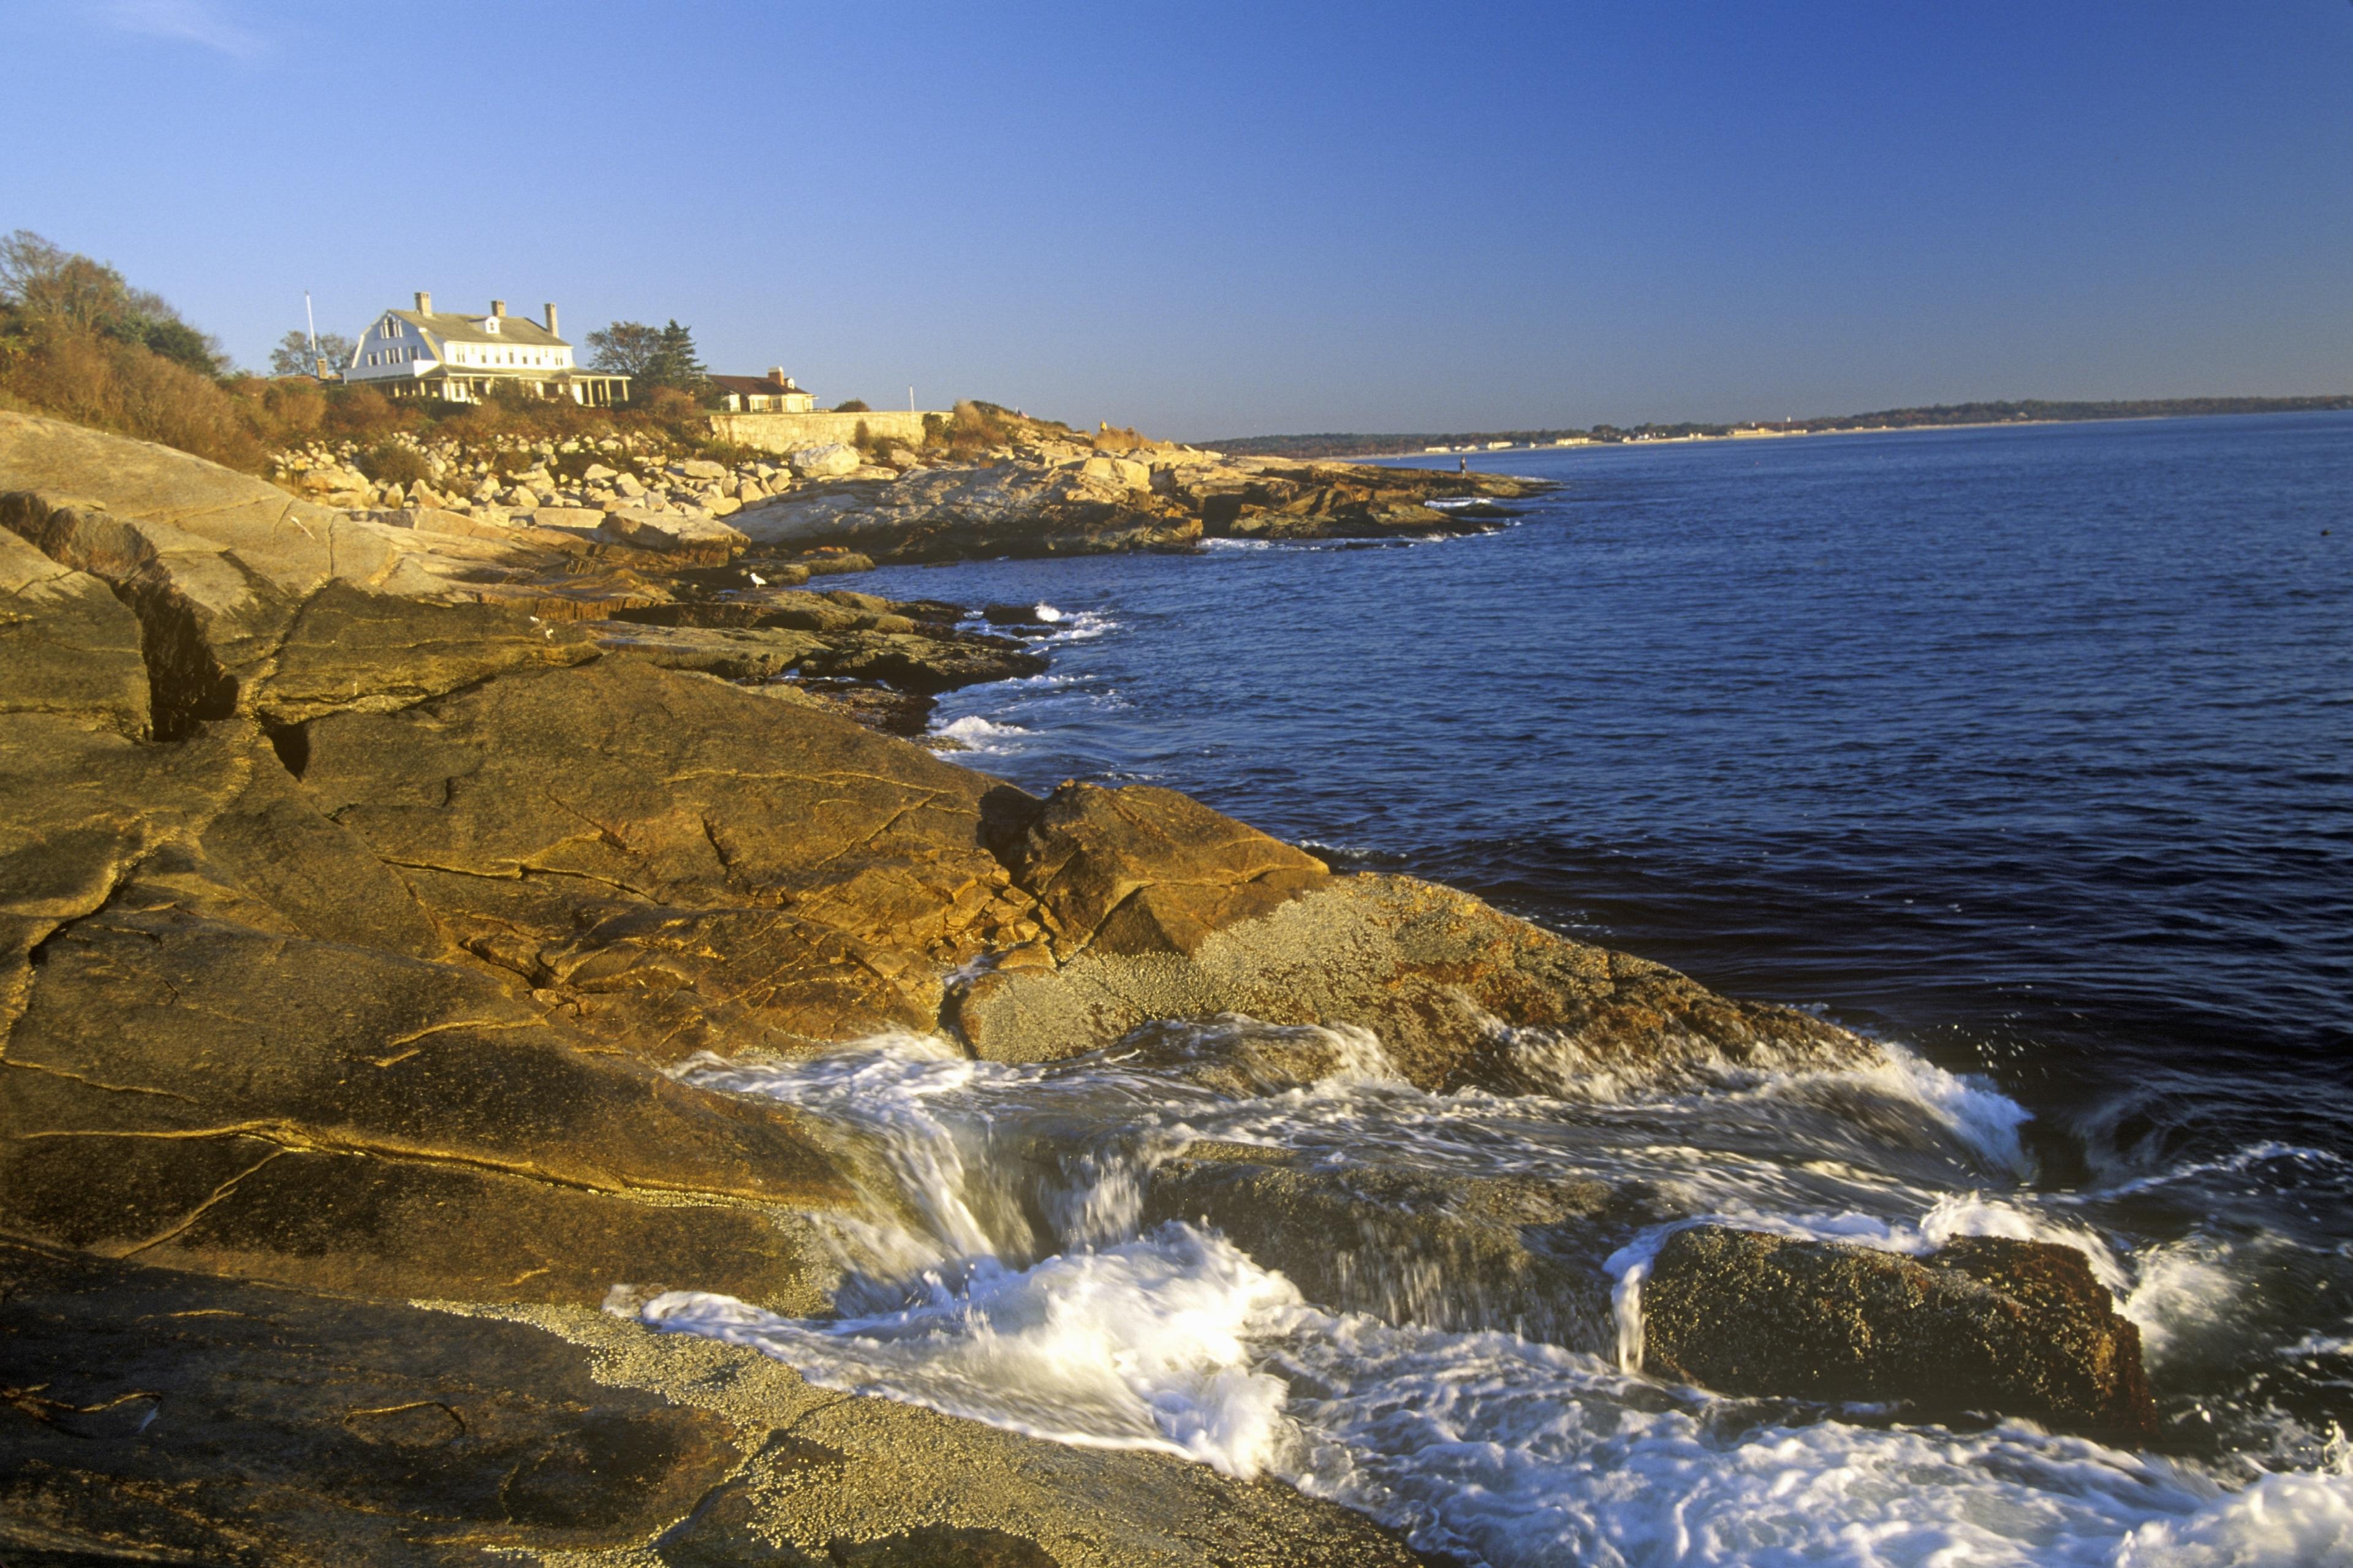 Misquamicut, Rhode Island, United States of America